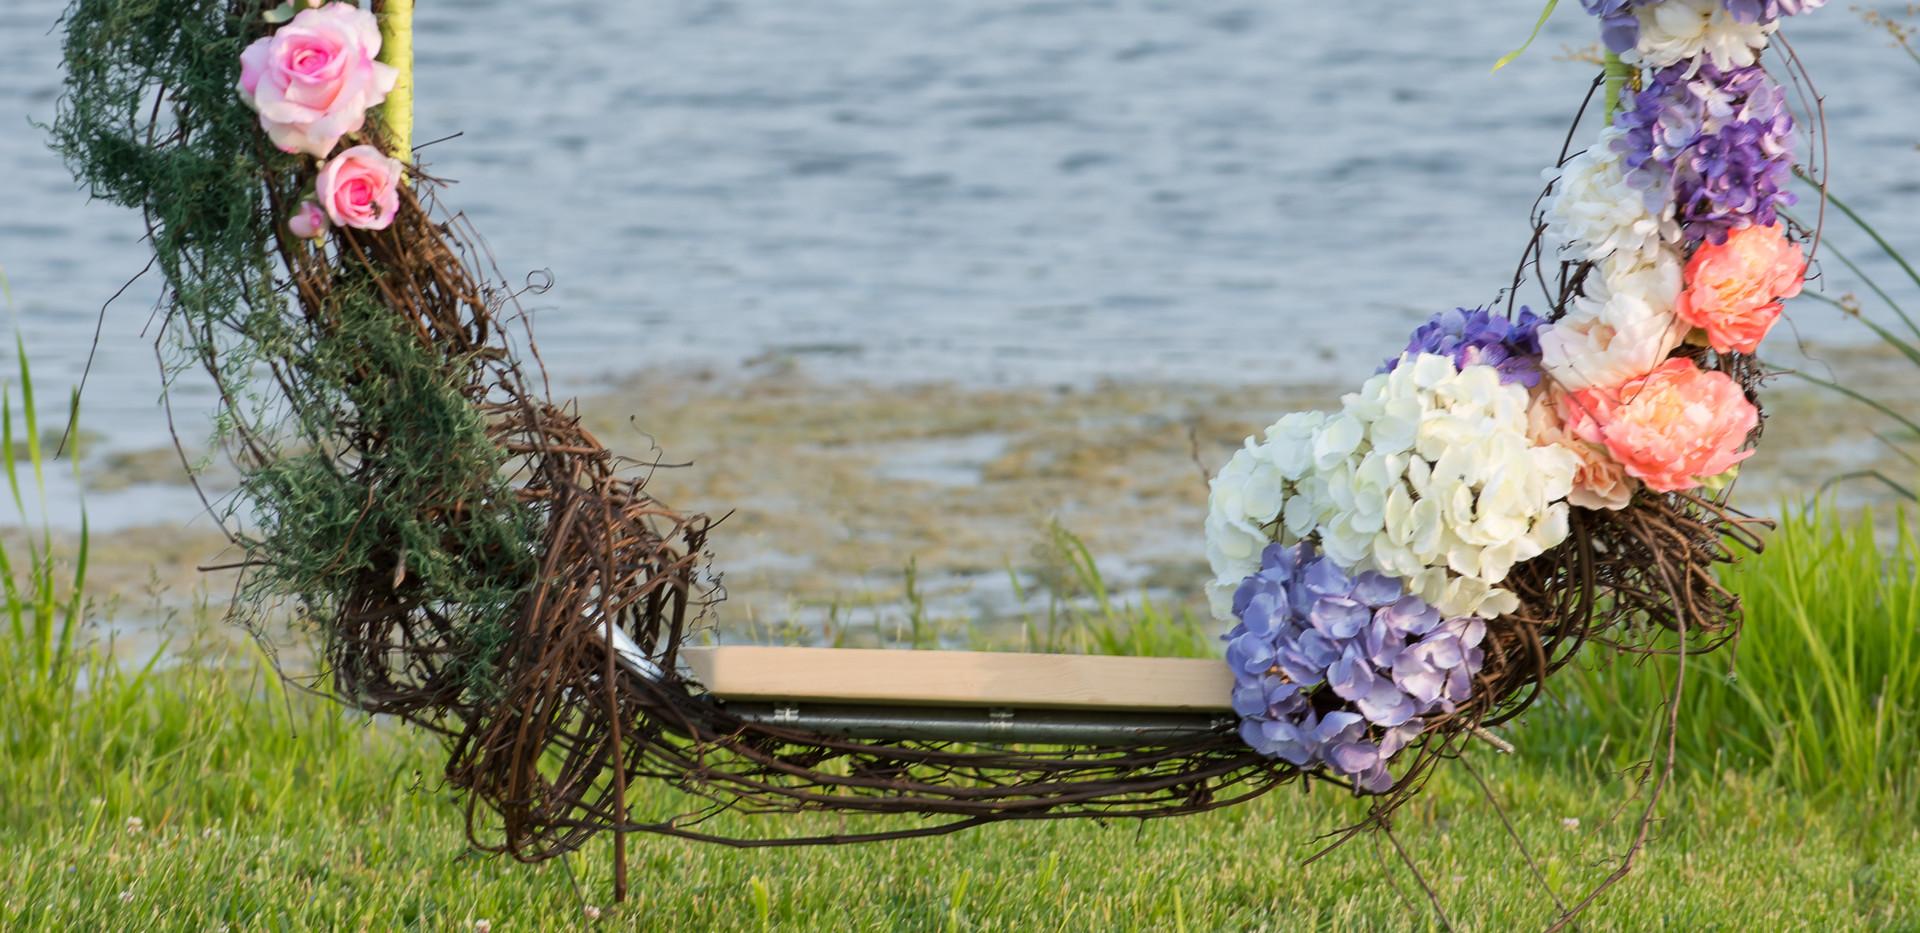 Floral-Grapevine Swing - Rentable Item